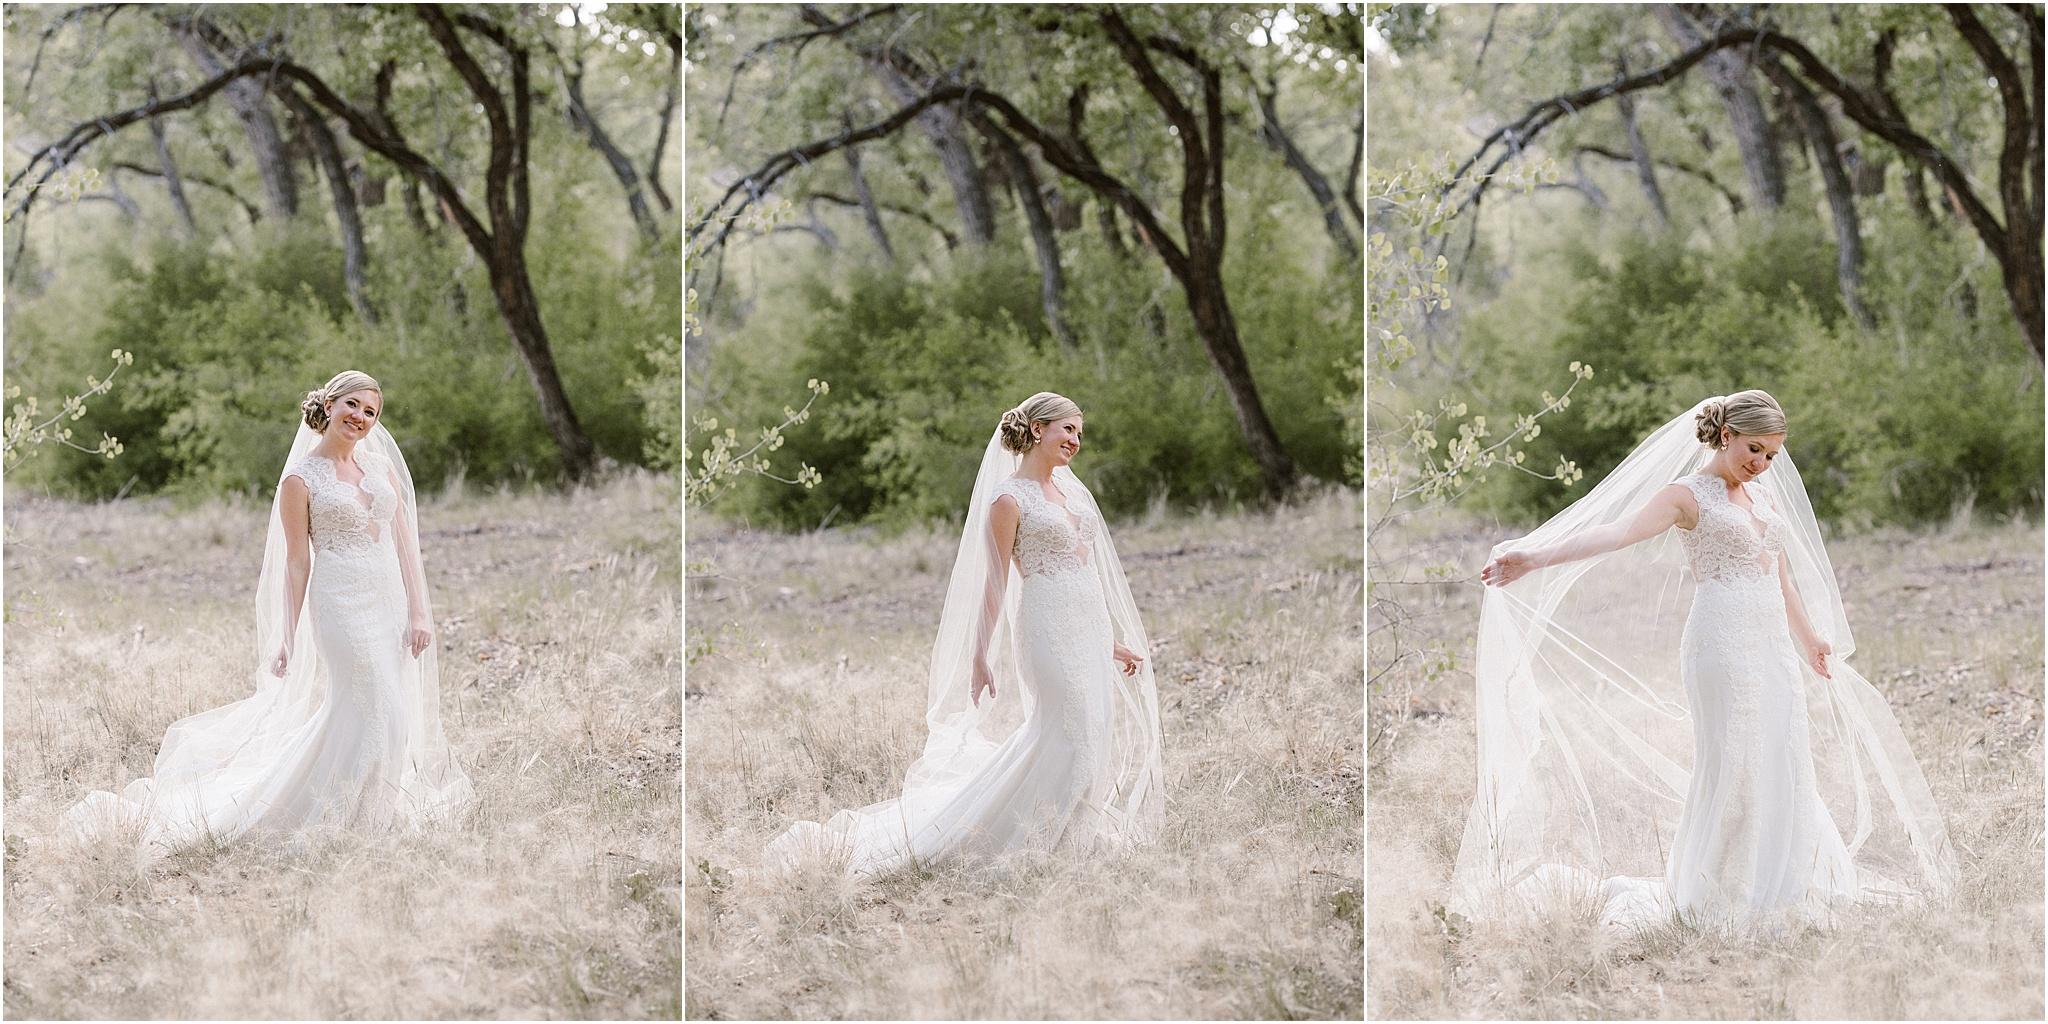 JENNA_JEROME_BLUE ROSE PHOTOGRAPHY_ABQ WEDDING_31